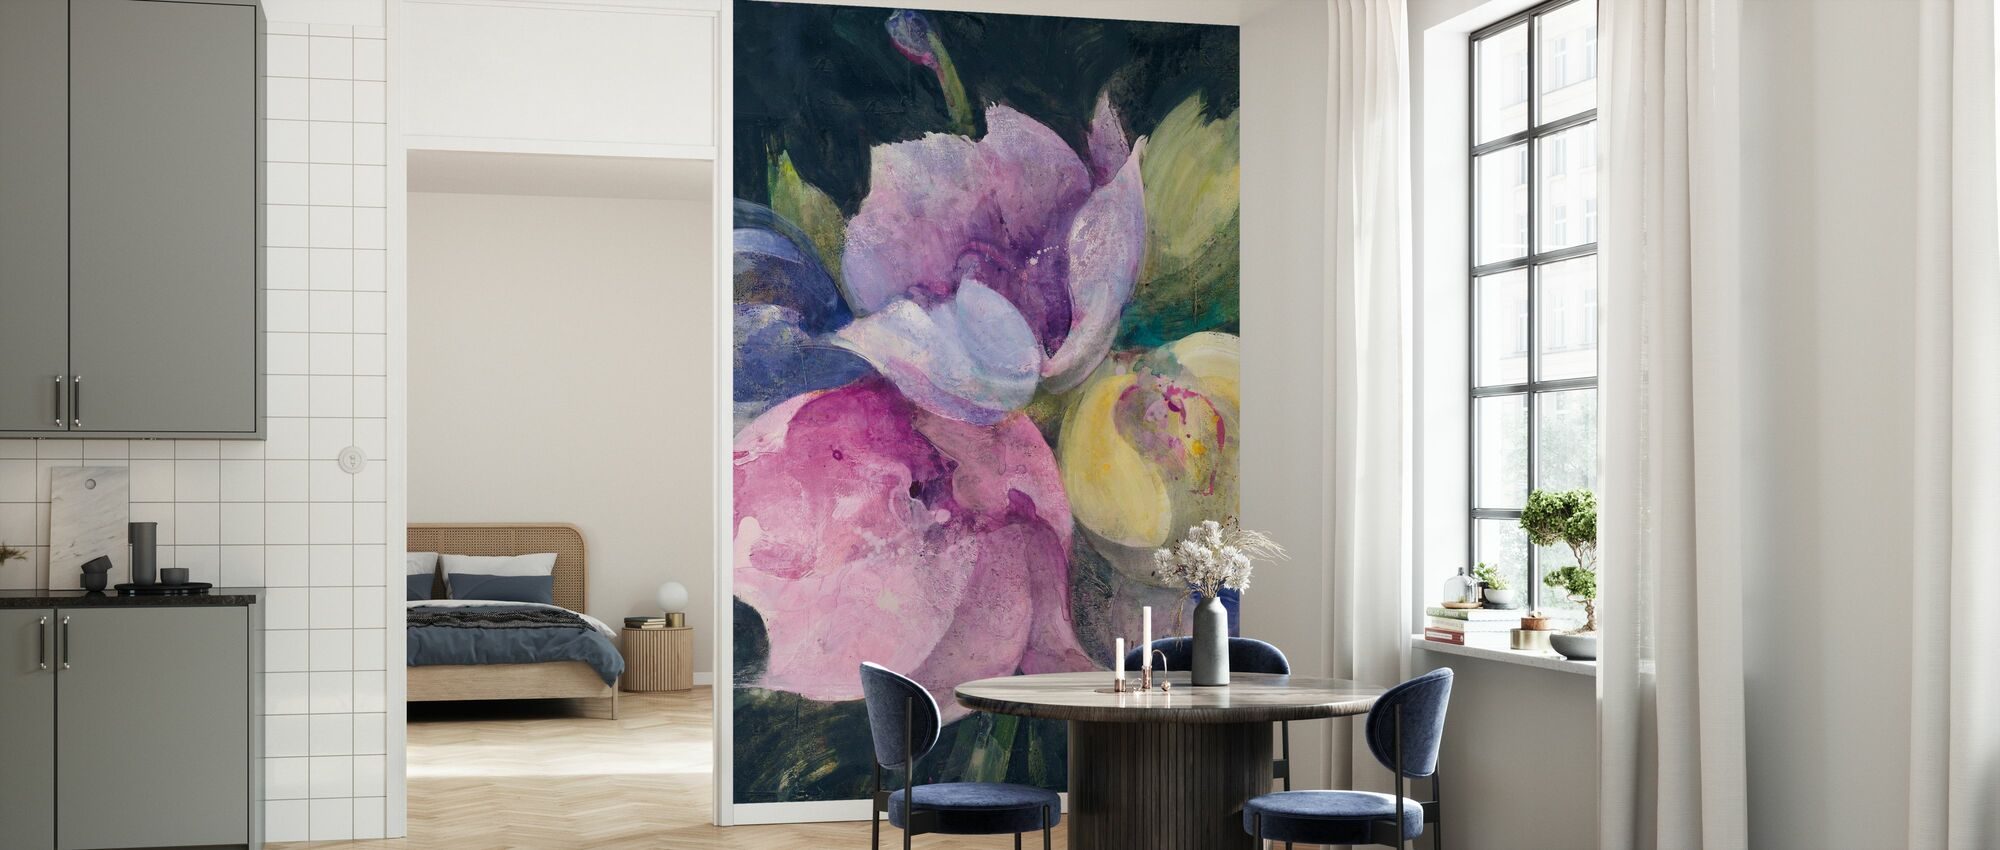 Tulips Galore - Wallpaper - Kitchen